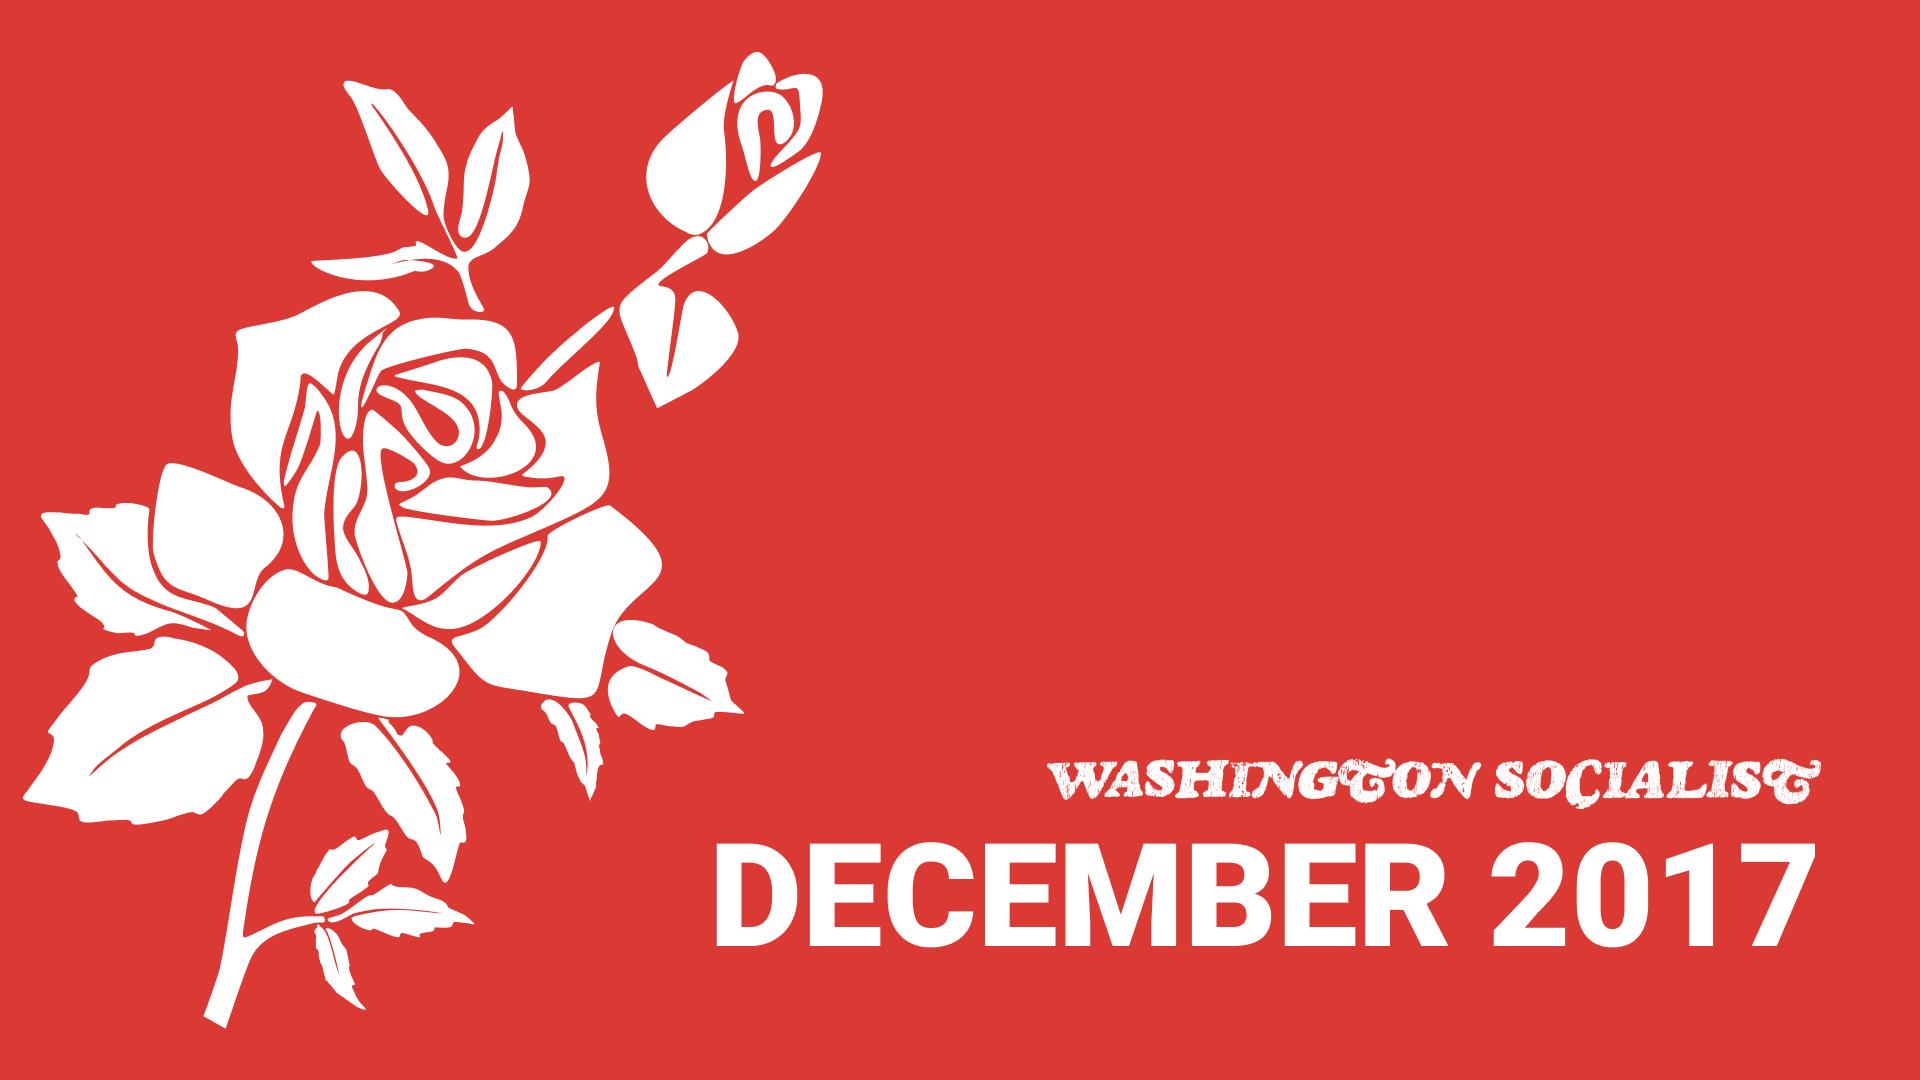 Washington Socialist Cover, December 2017